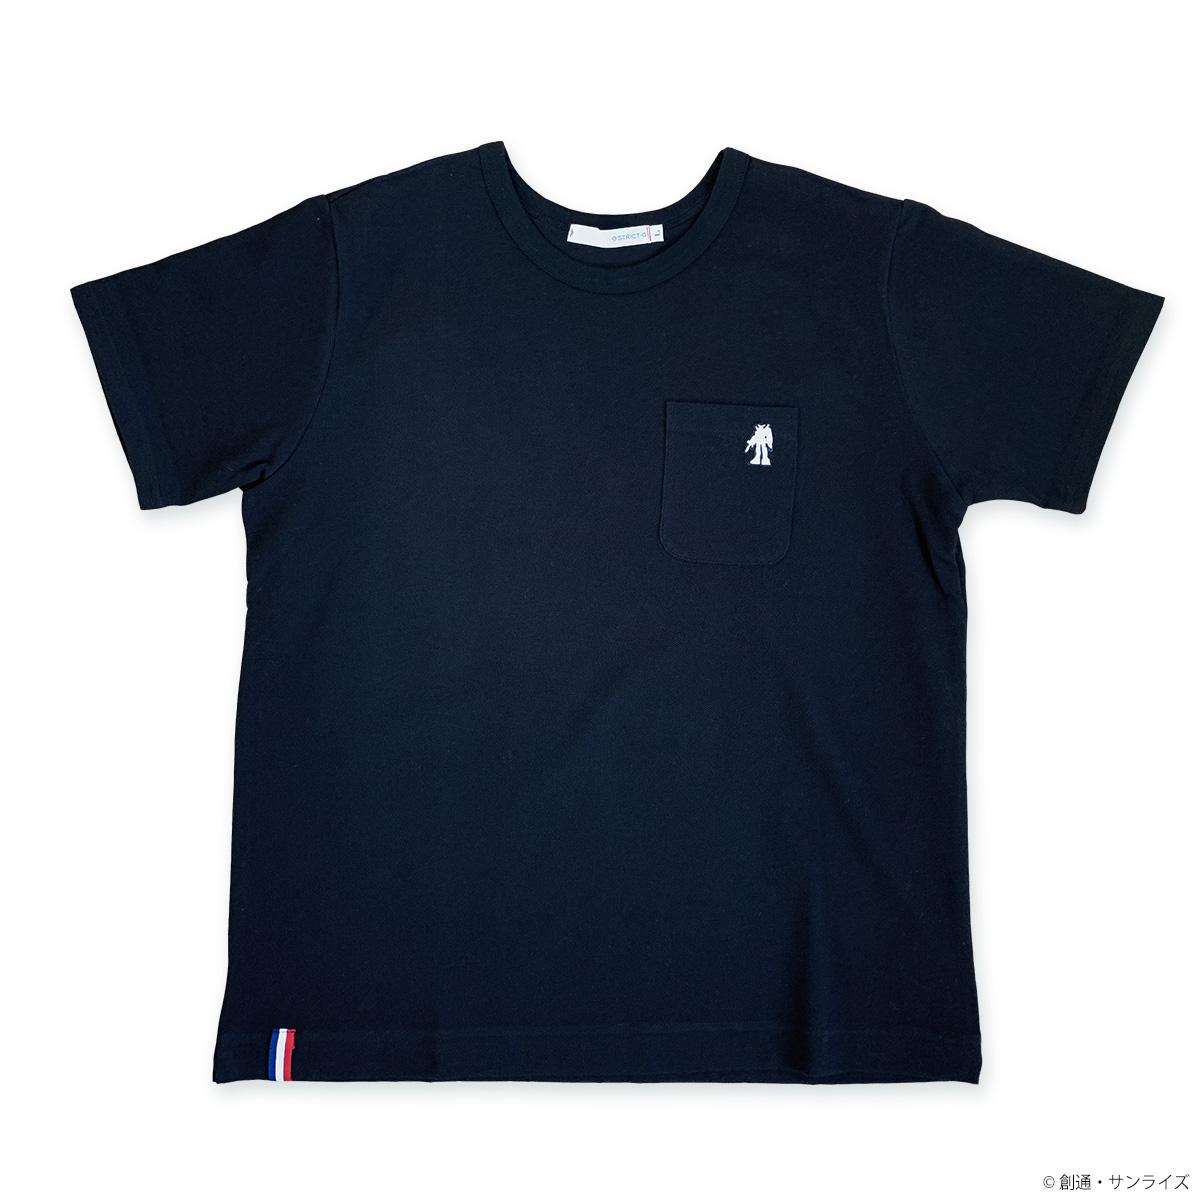 STRICT-G BASIC『機動戦士ガンダム』鹿の子ポケット付Tシャツ